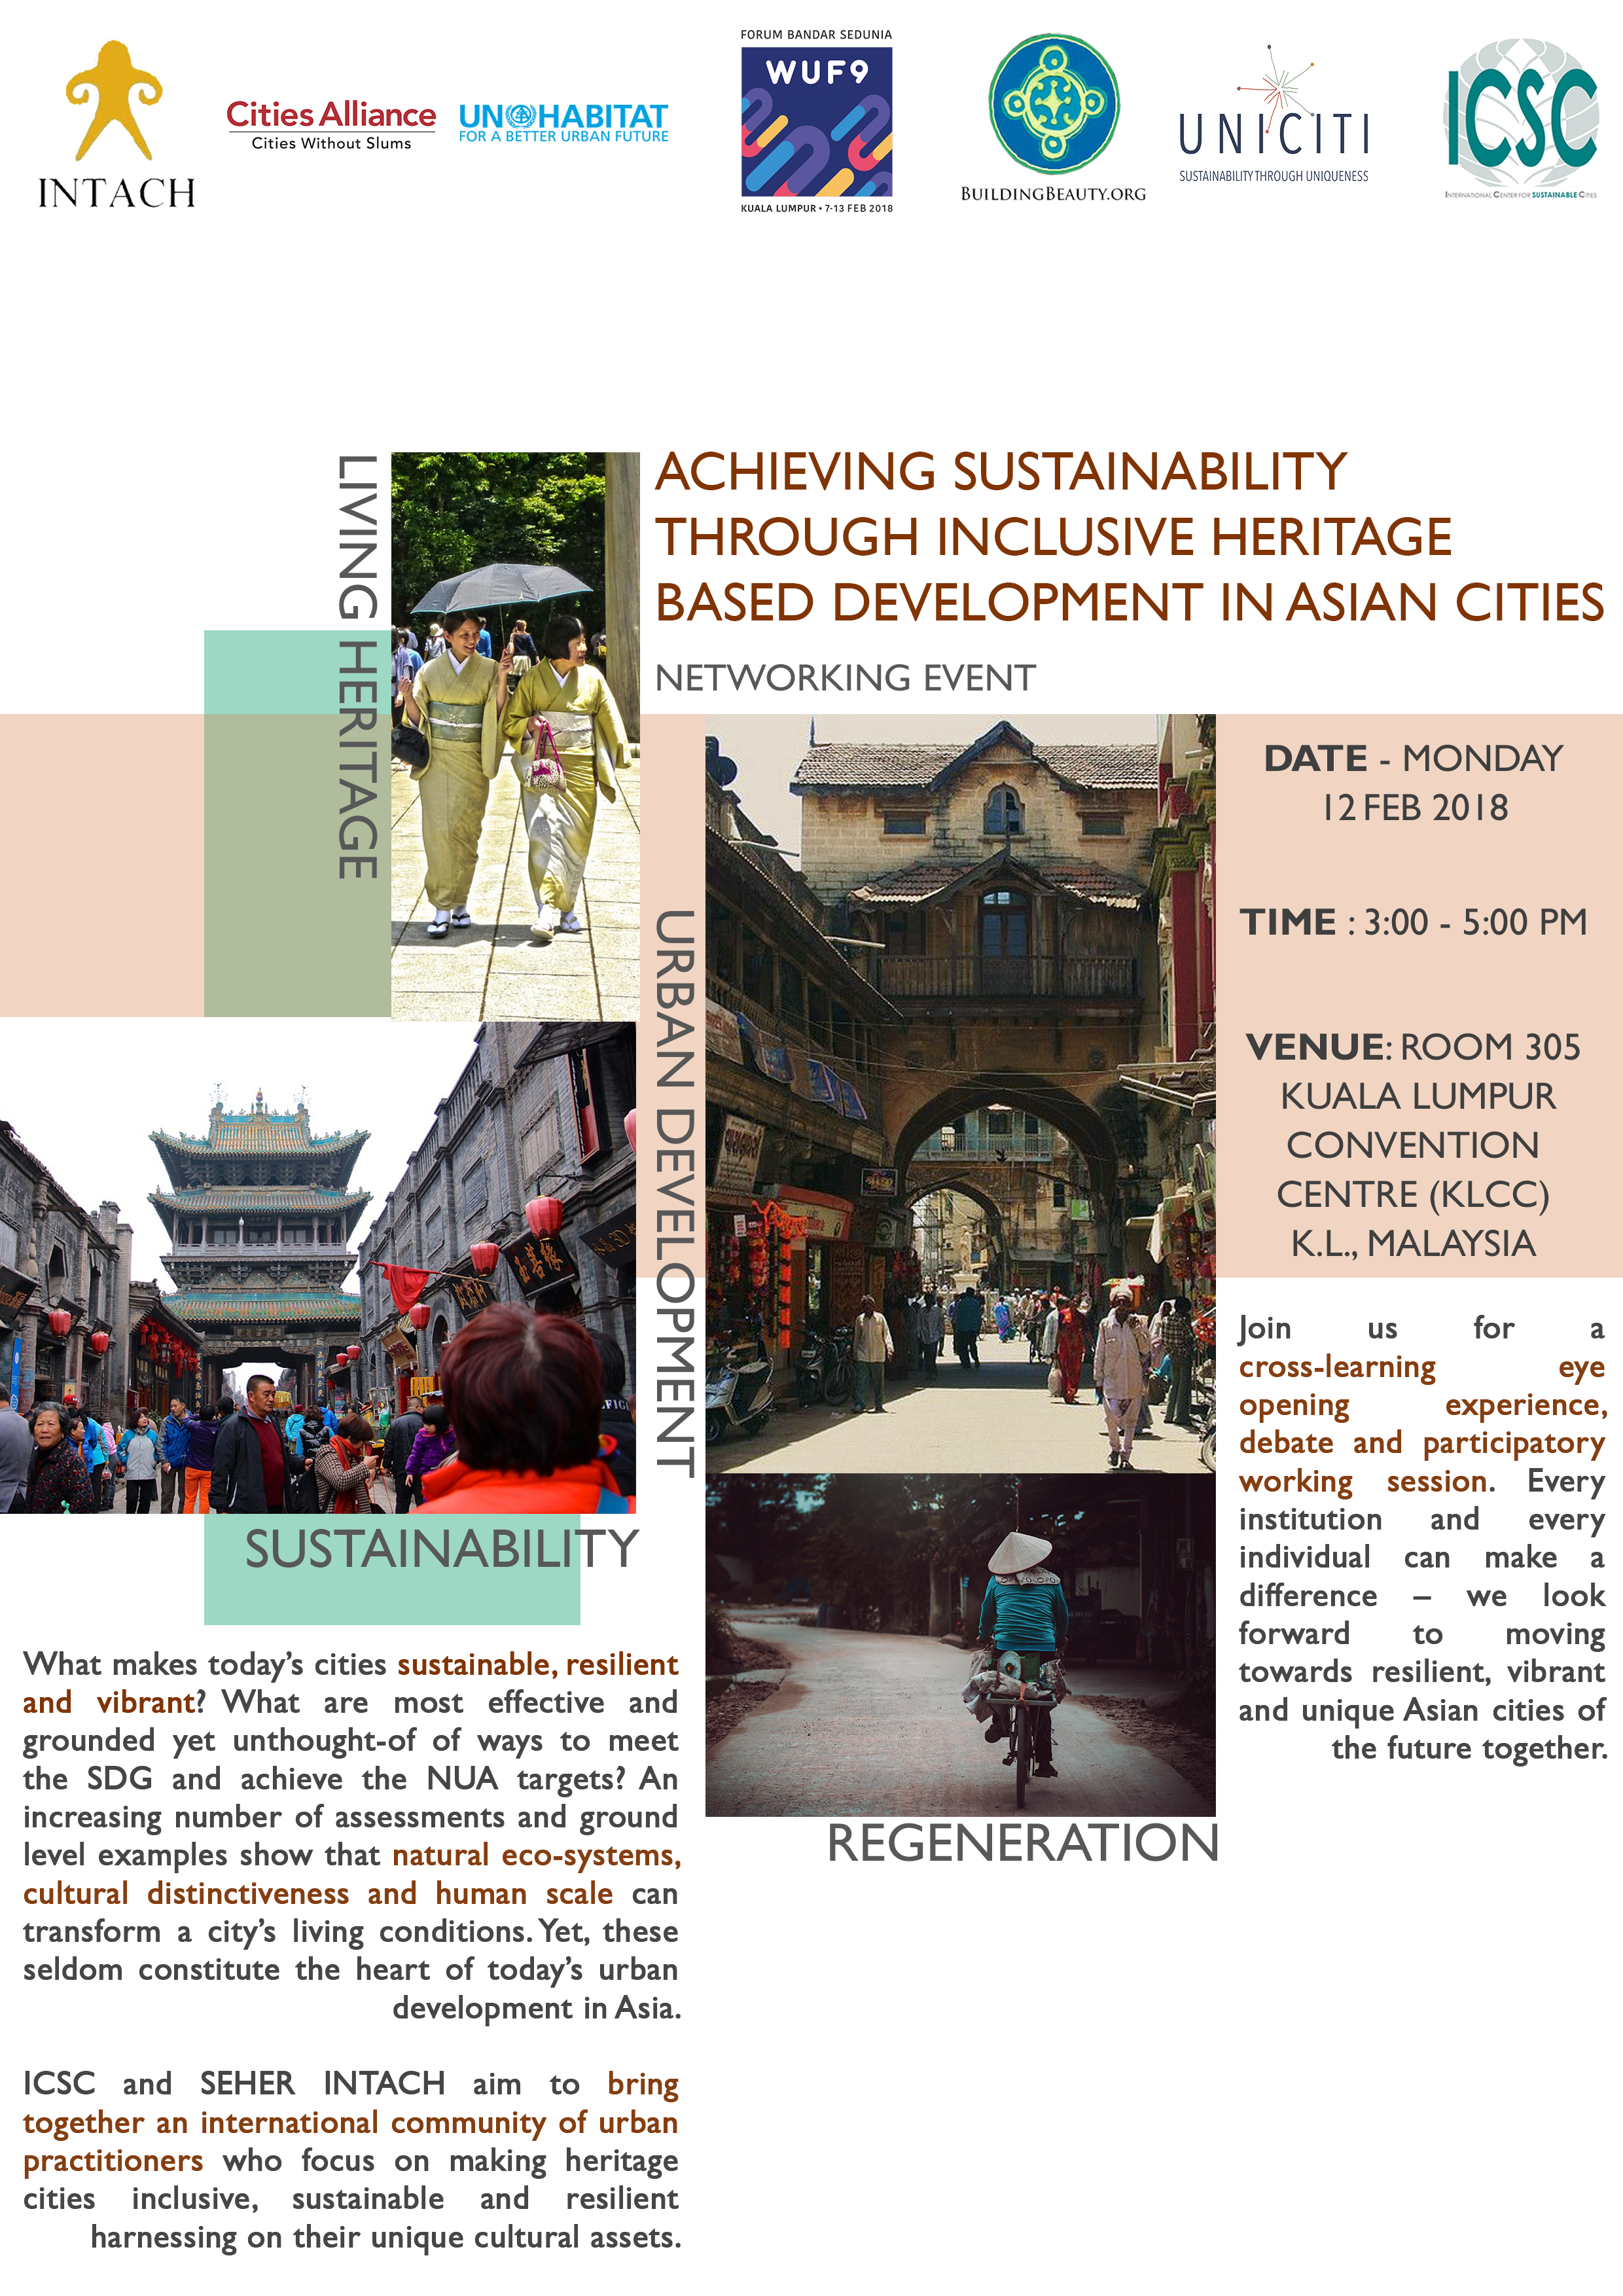 wuf-9-sustainable-cities-through-heritage-invitation-002.jpg